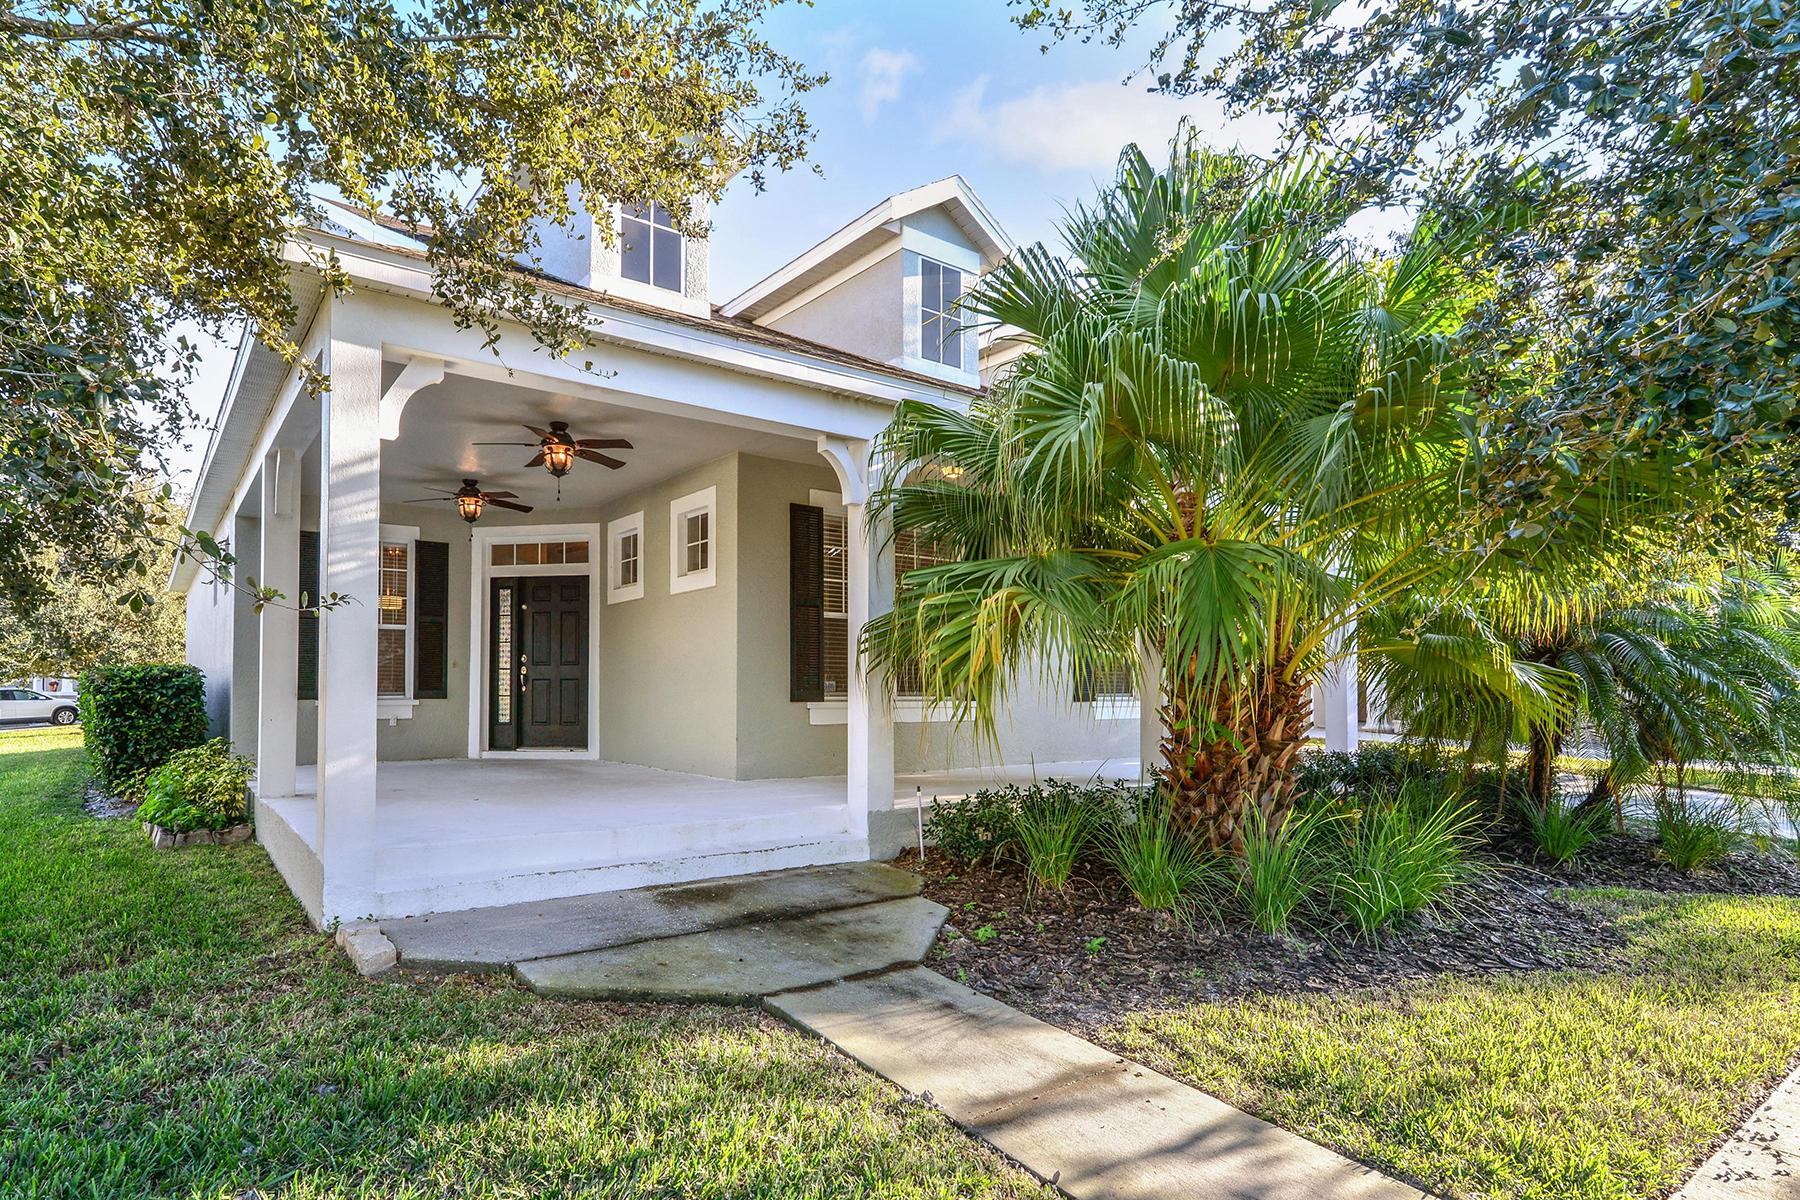 Moradia para Venda às Windermere, Florida 14032 Eden Isle Blvd Windermere, Florida, 34786 Estados Unidos